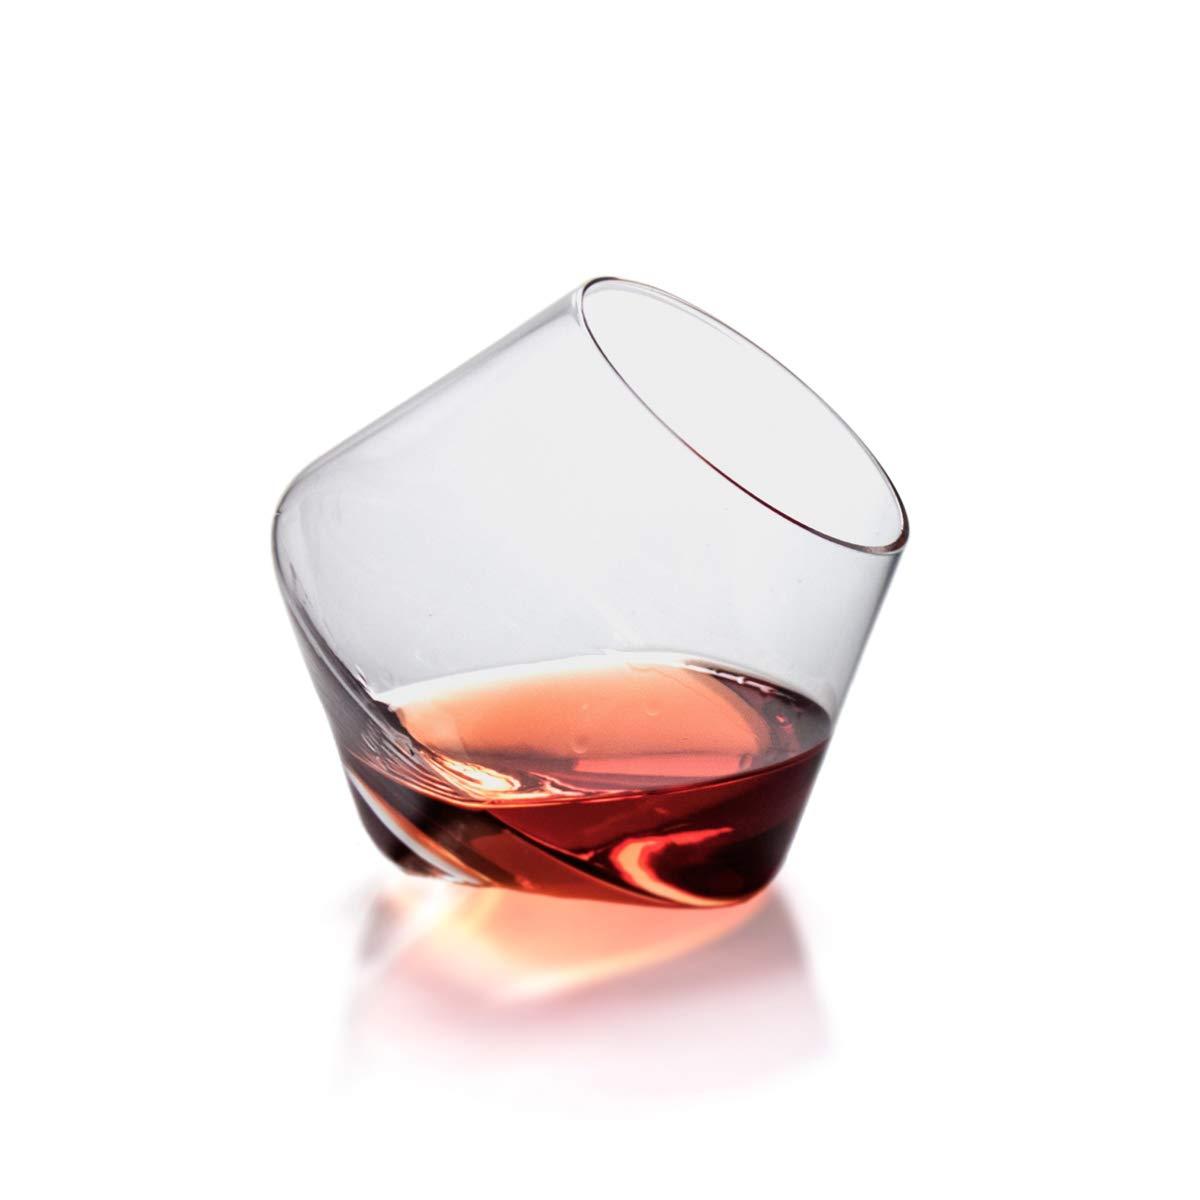 Sempli Cupa-Rocks Clear Whiskey Glasses, Set of 2 in Gift Box CUPRX